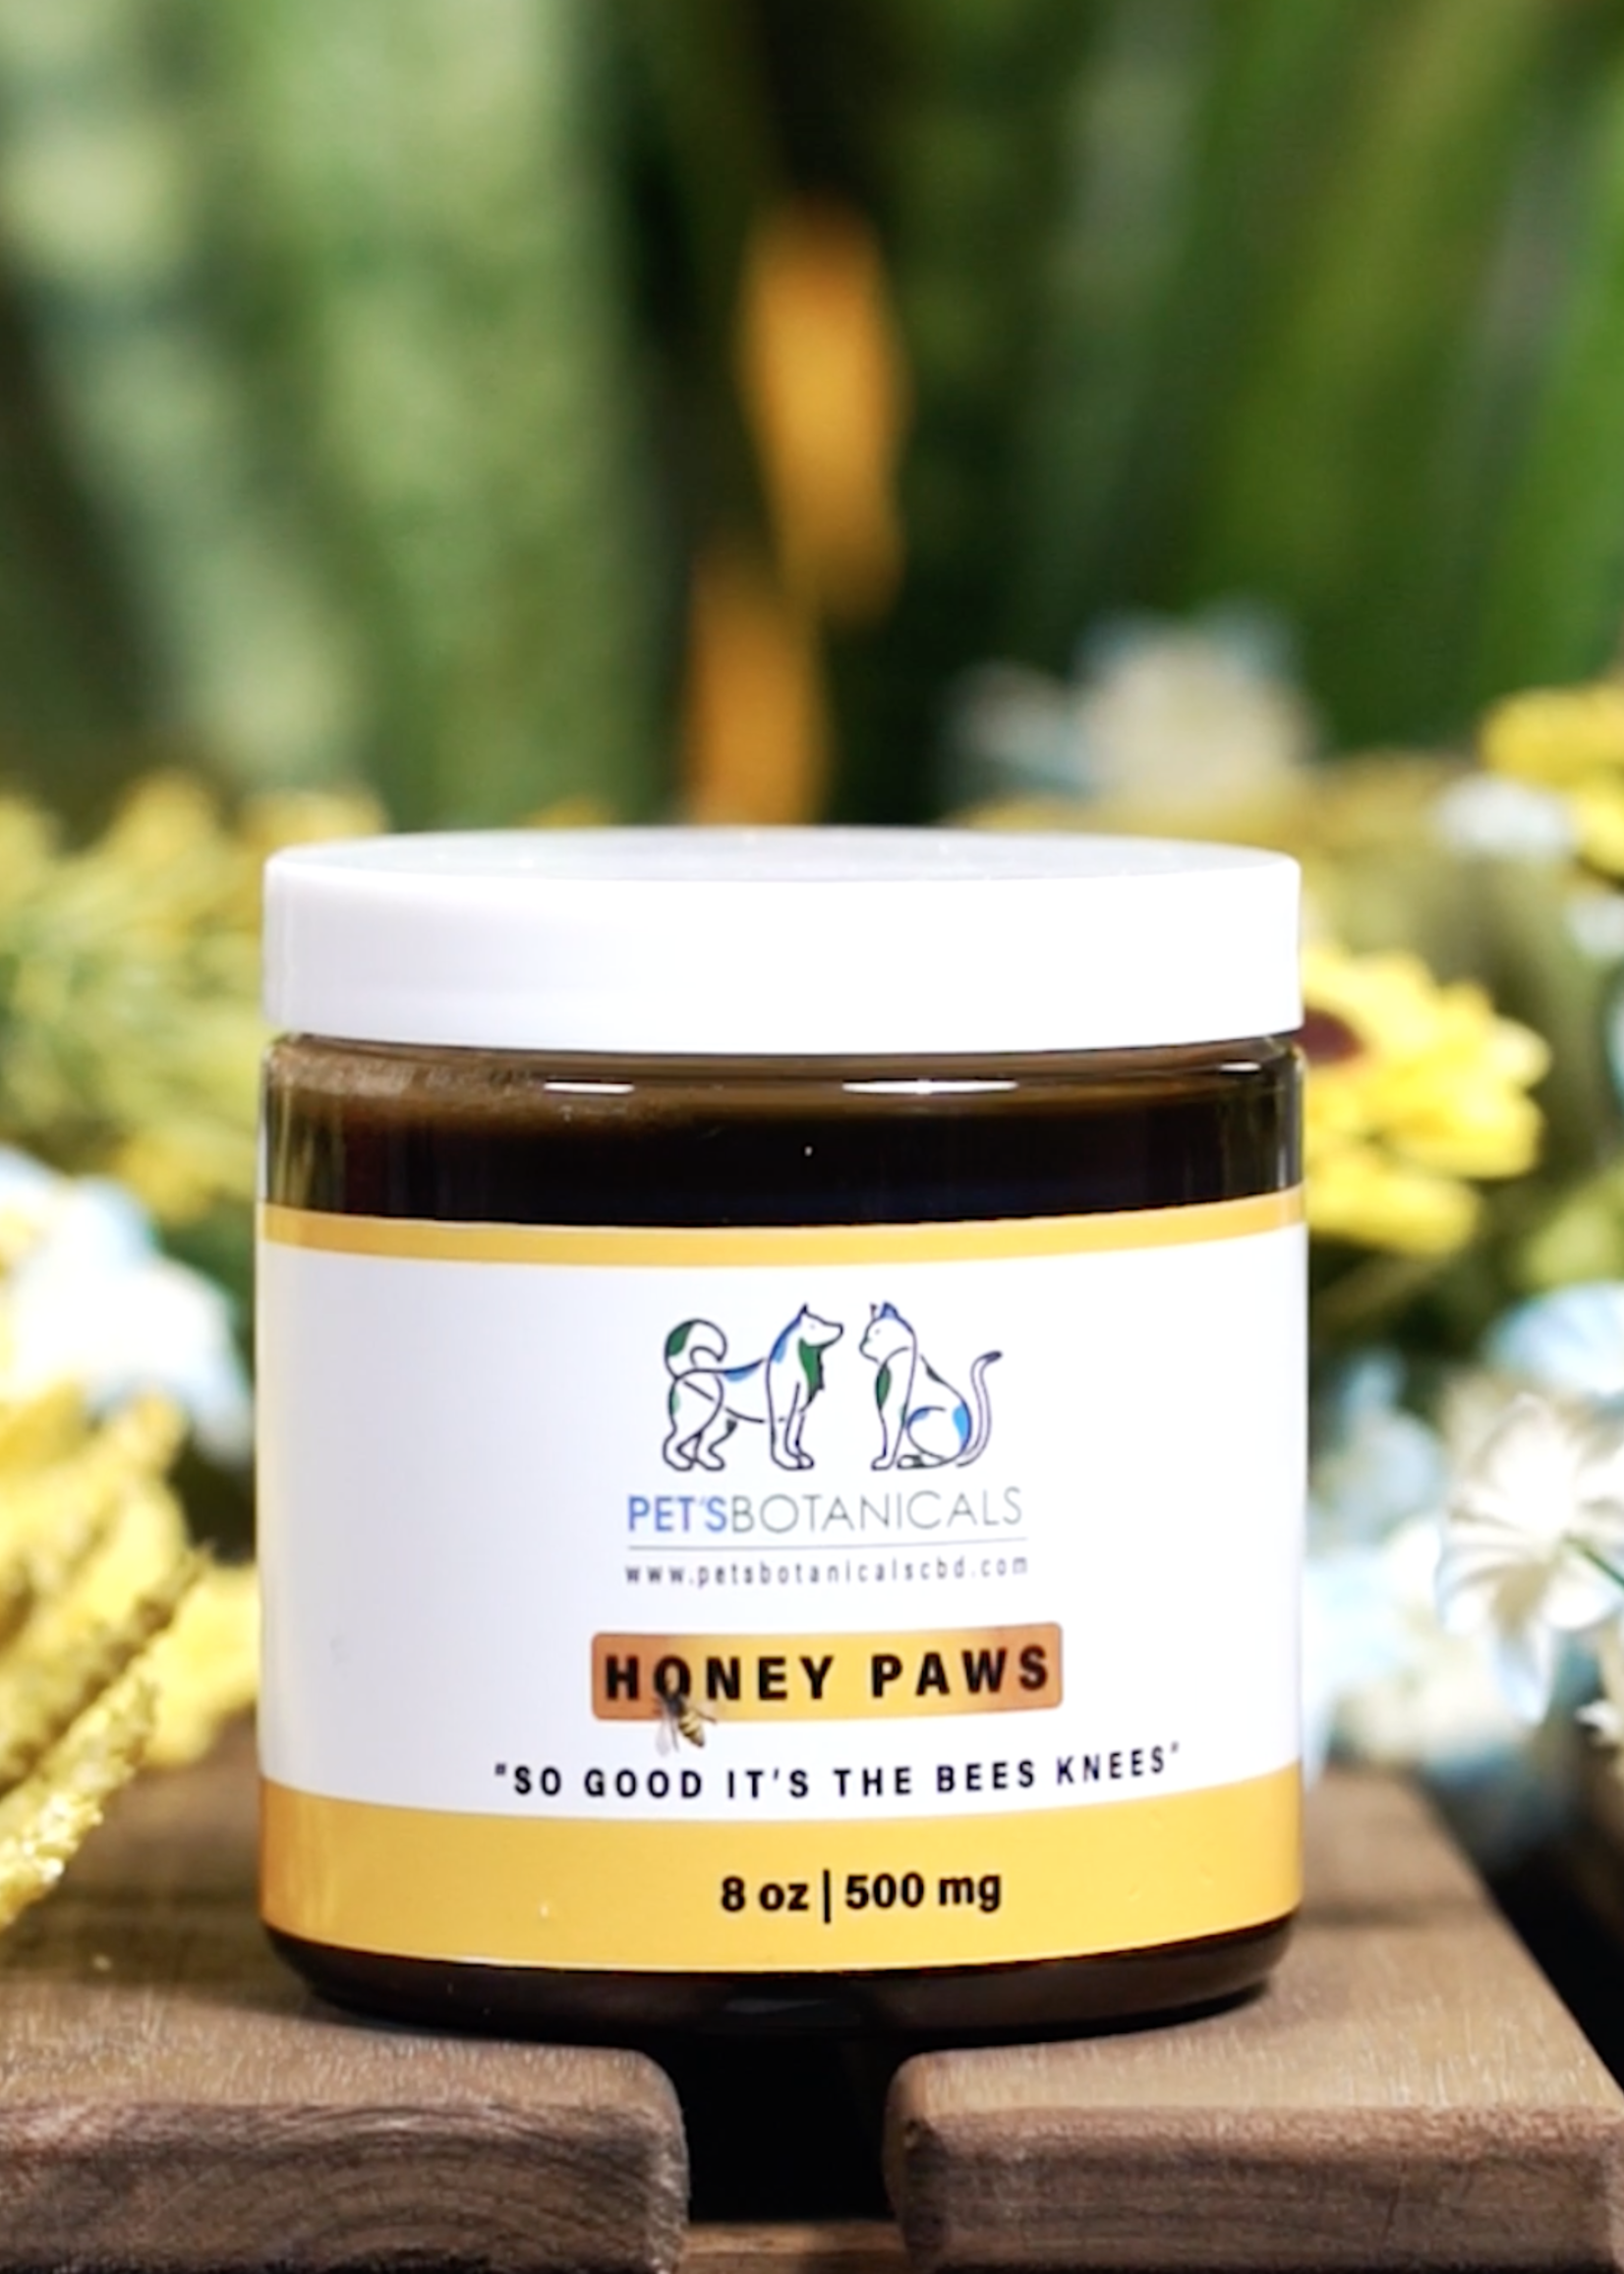 Pet's Botanicals Pet's Botanicals Honey Paws 8 oz 500mg CBD